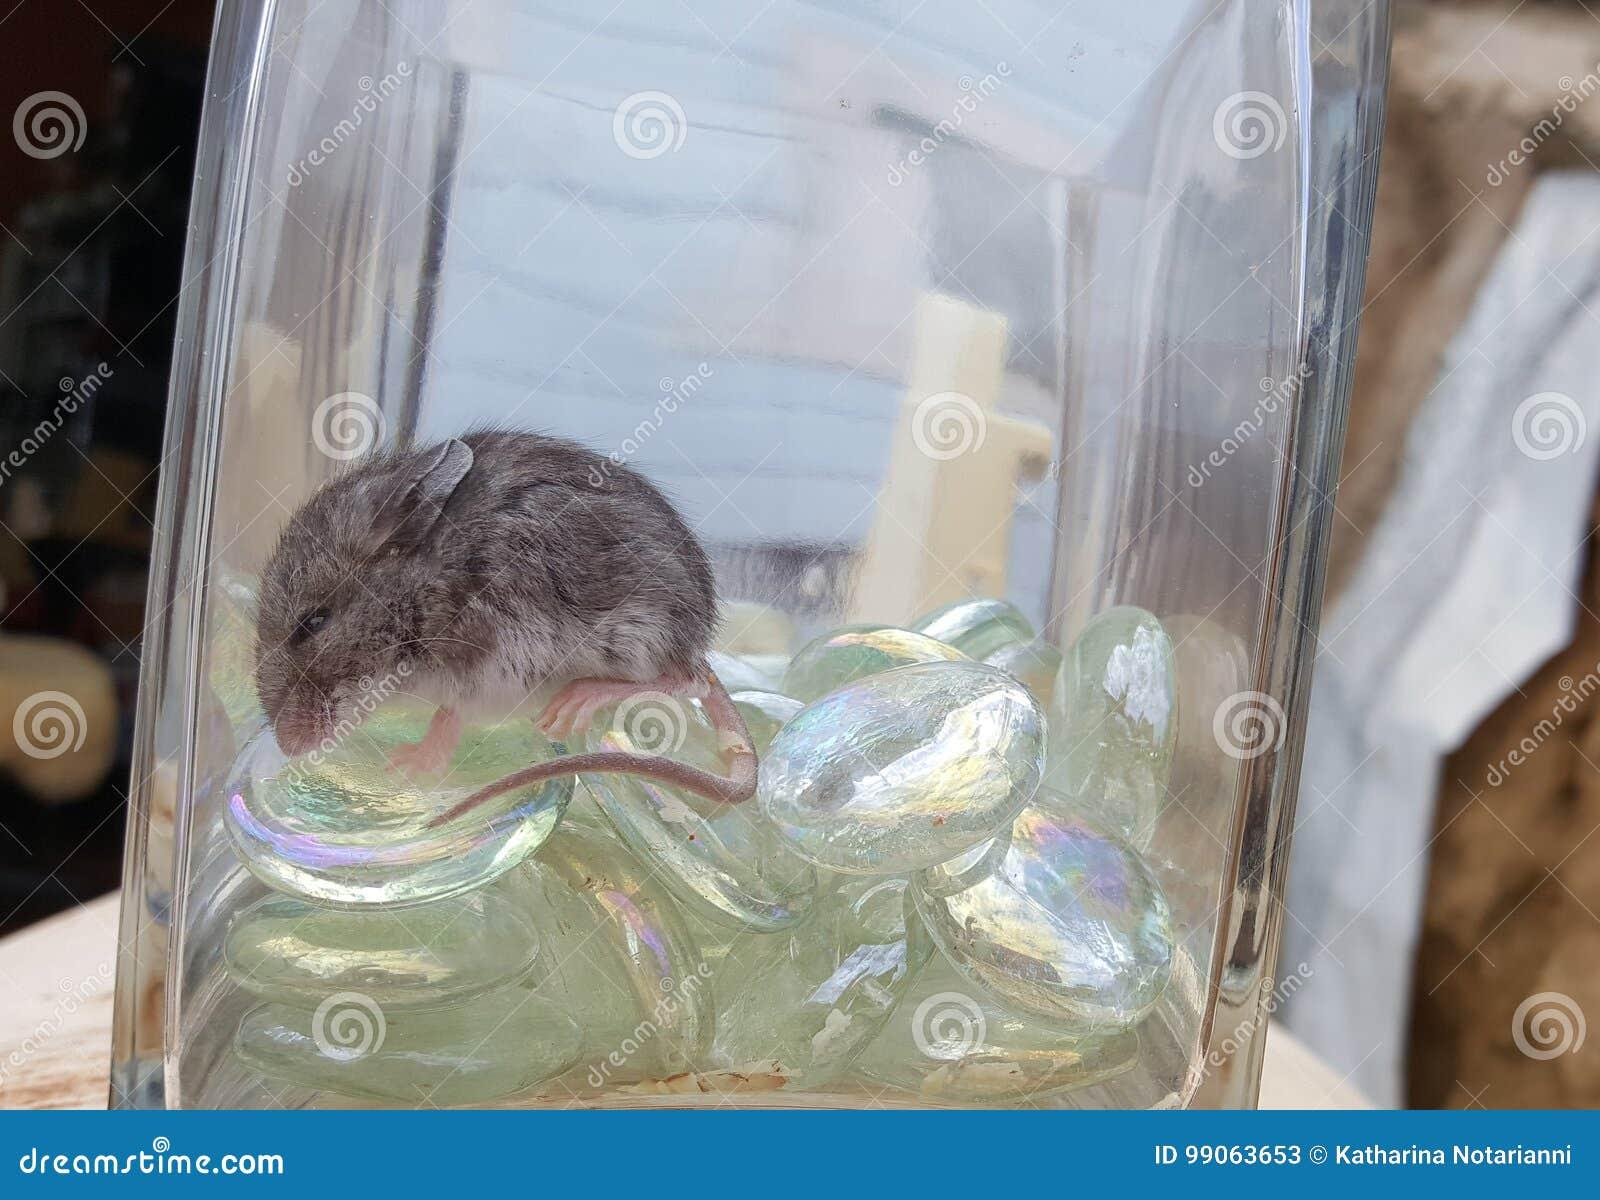 Kangaroo Rat Merriam Kangaroo Rat Dipodomys merriami Sleeping in Glass